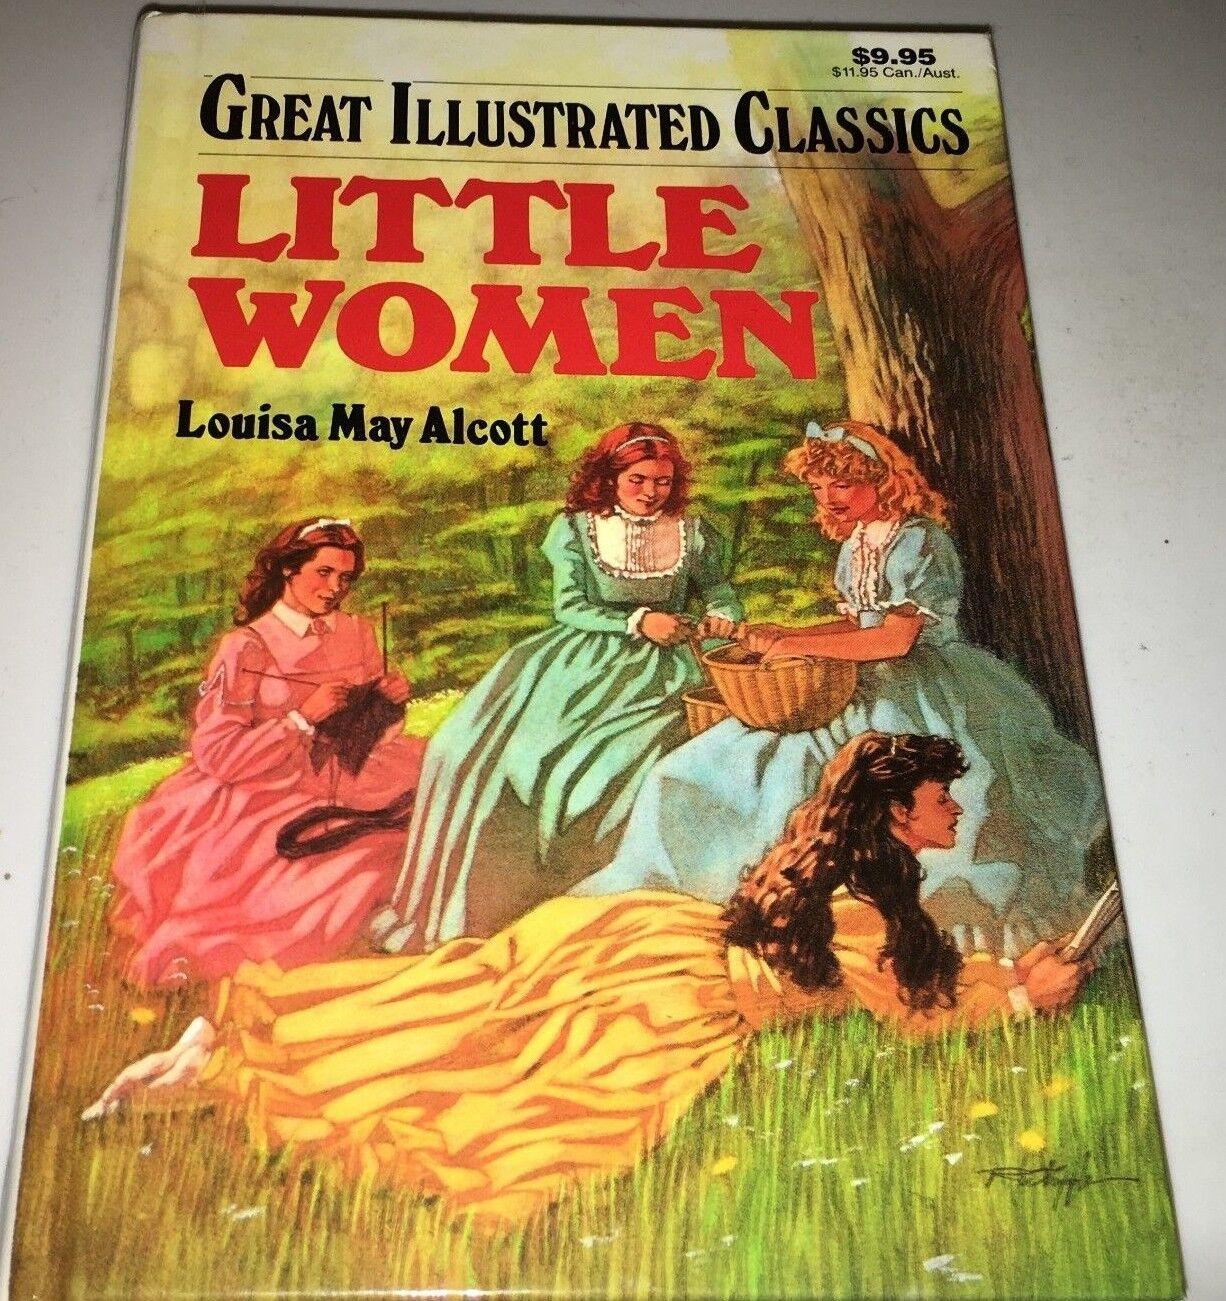 Great Illustrated Classics Little Women Vol. 4 1989, Hardcover 9L - $2.99